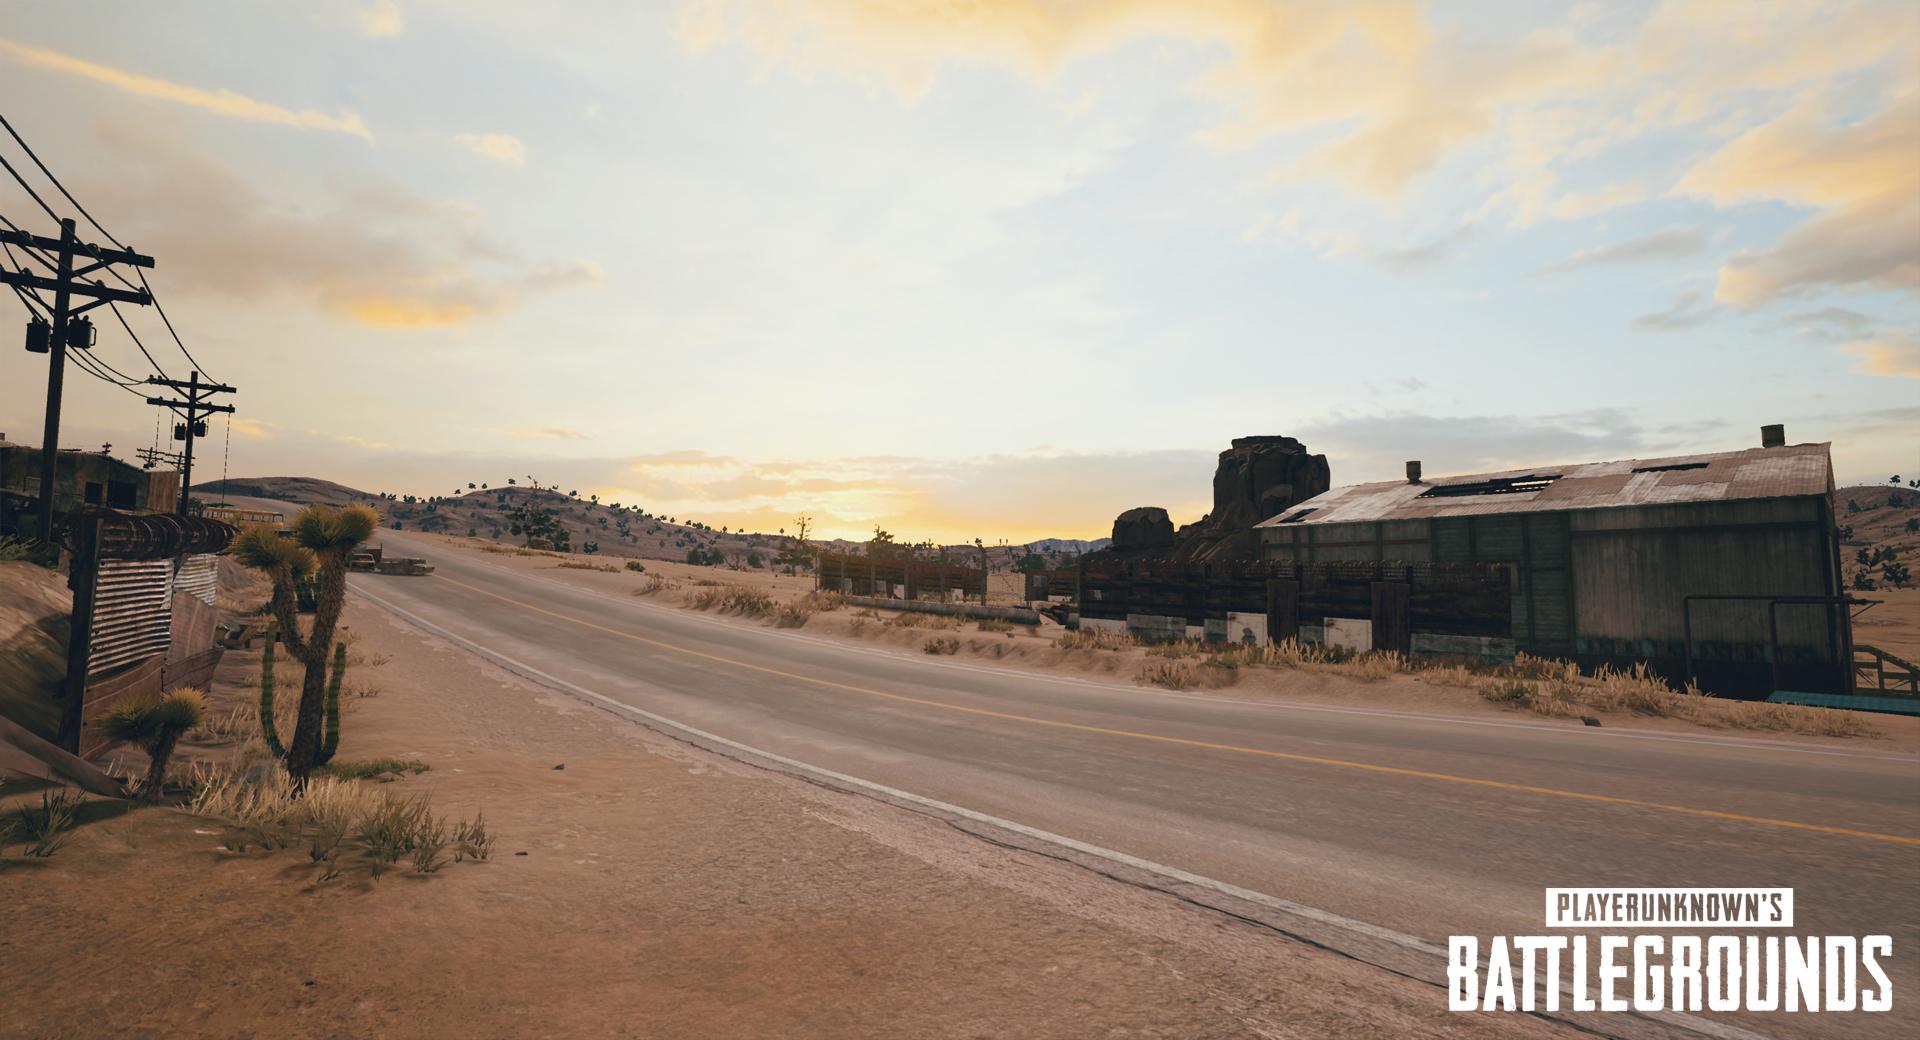 3d Halloween Live Wallpaper Pubg S Latest Test Build Reveals A Draft Of The New Desert